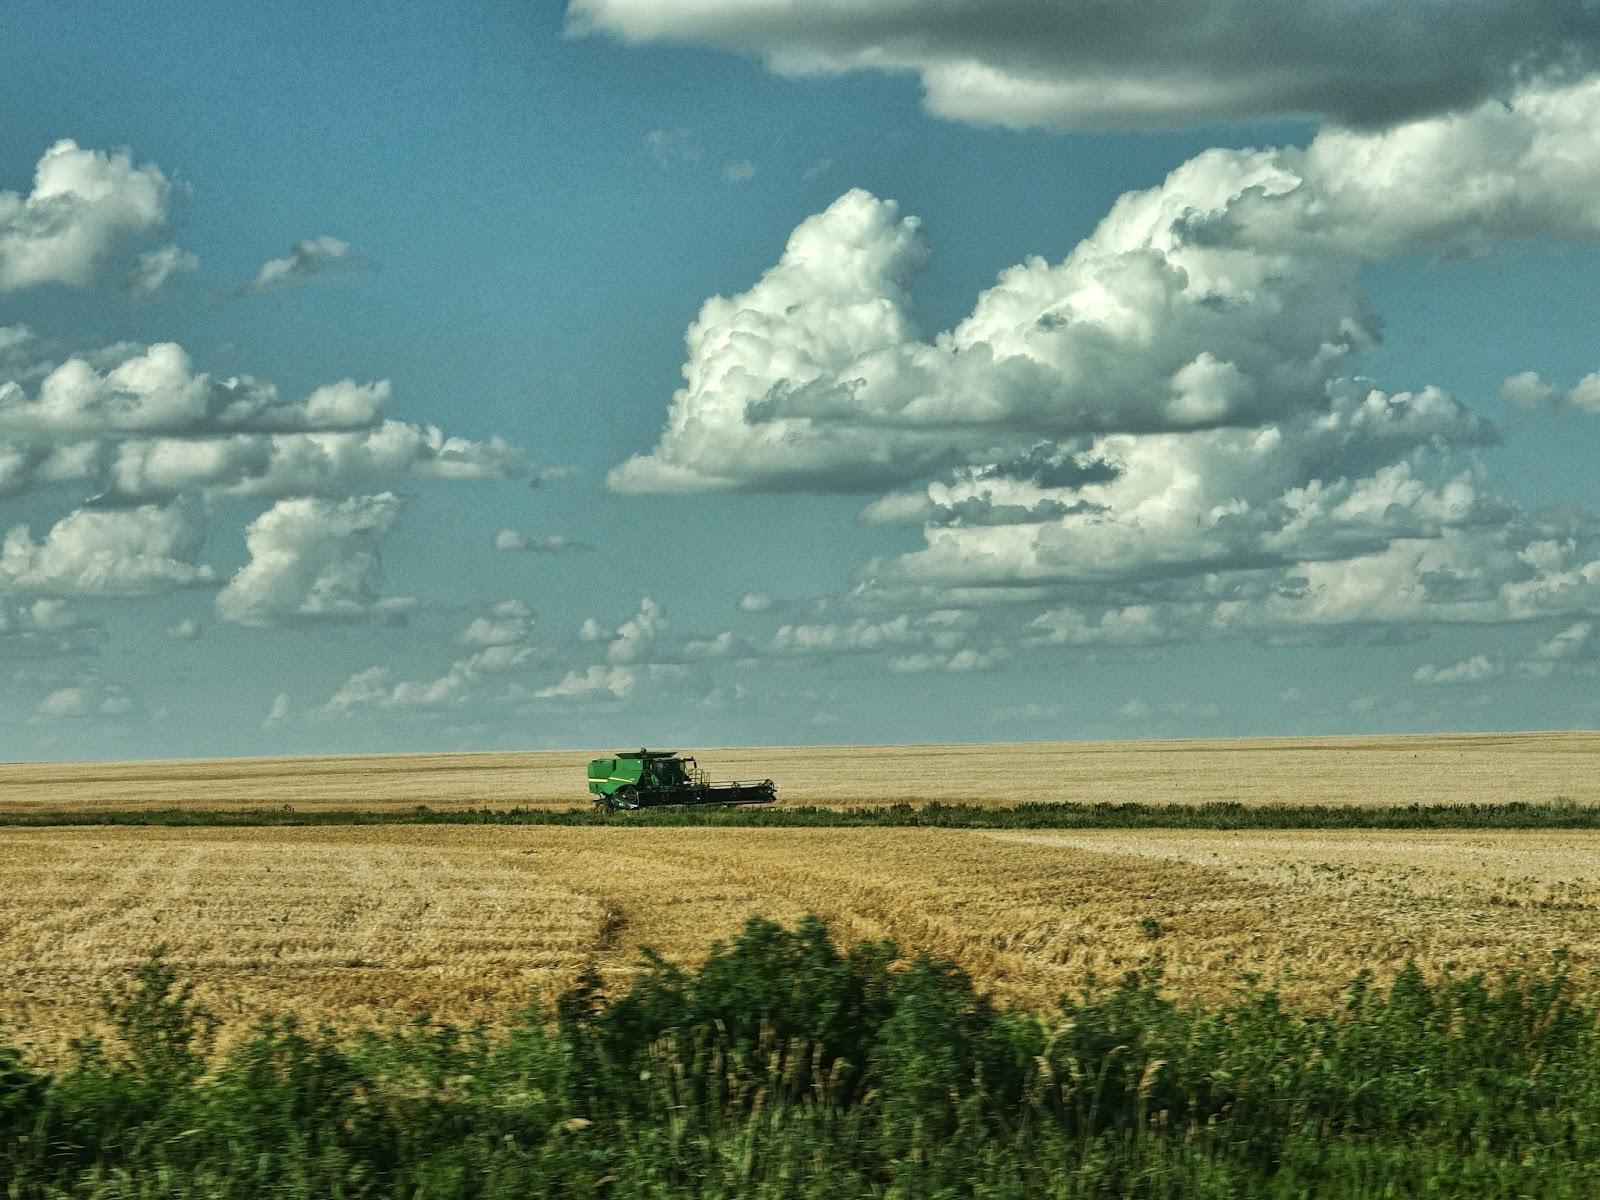 Phi Slamma Camera Kansas Candid Combine Amber Waves Of Grain